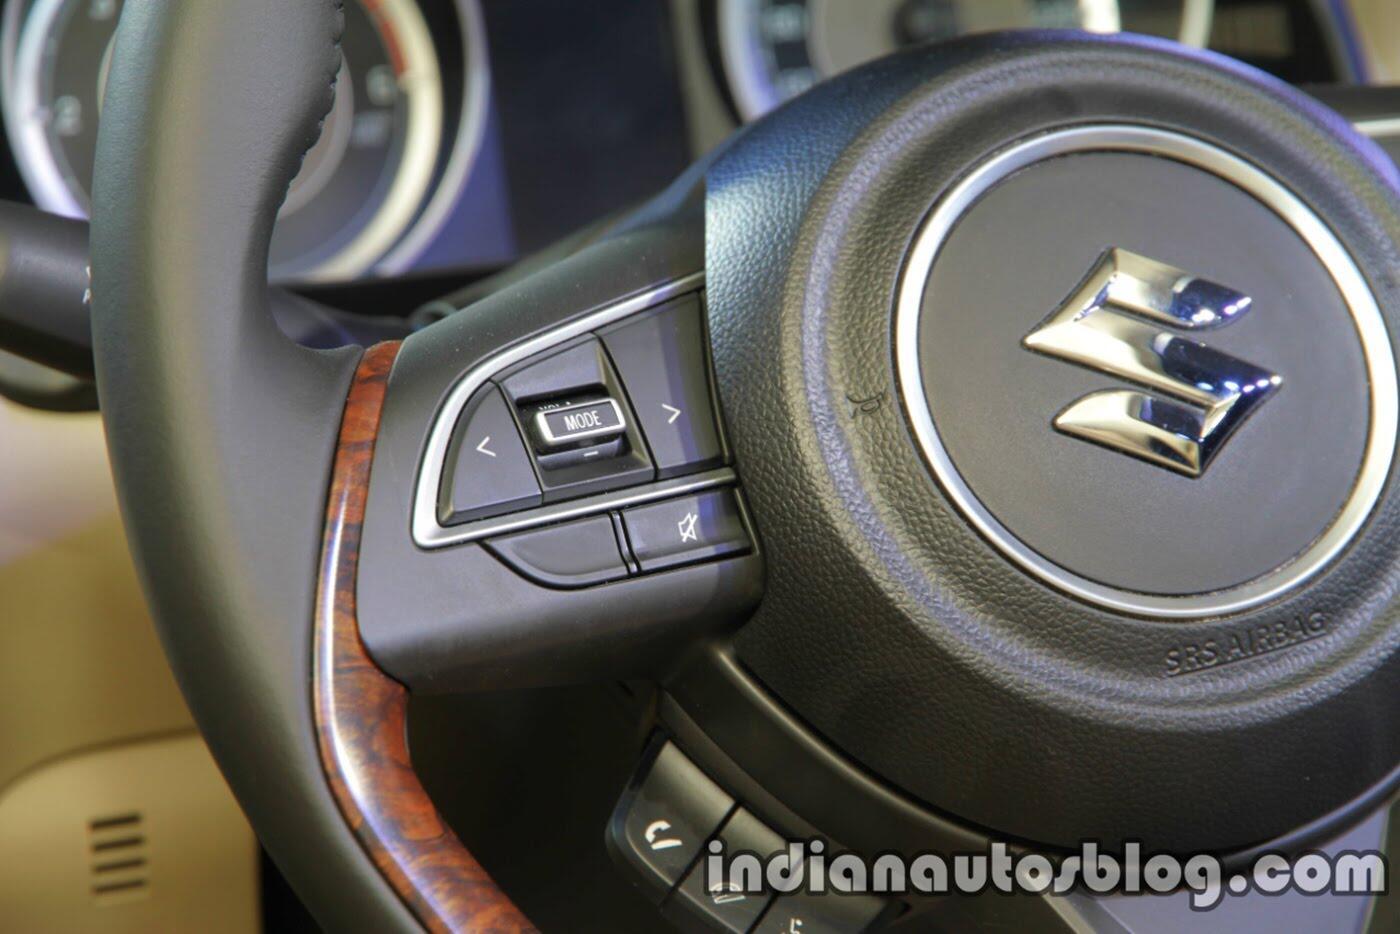 Xem thêm ảnh phiên bản sedan của Suzuki Swift 2018 - Hình 15